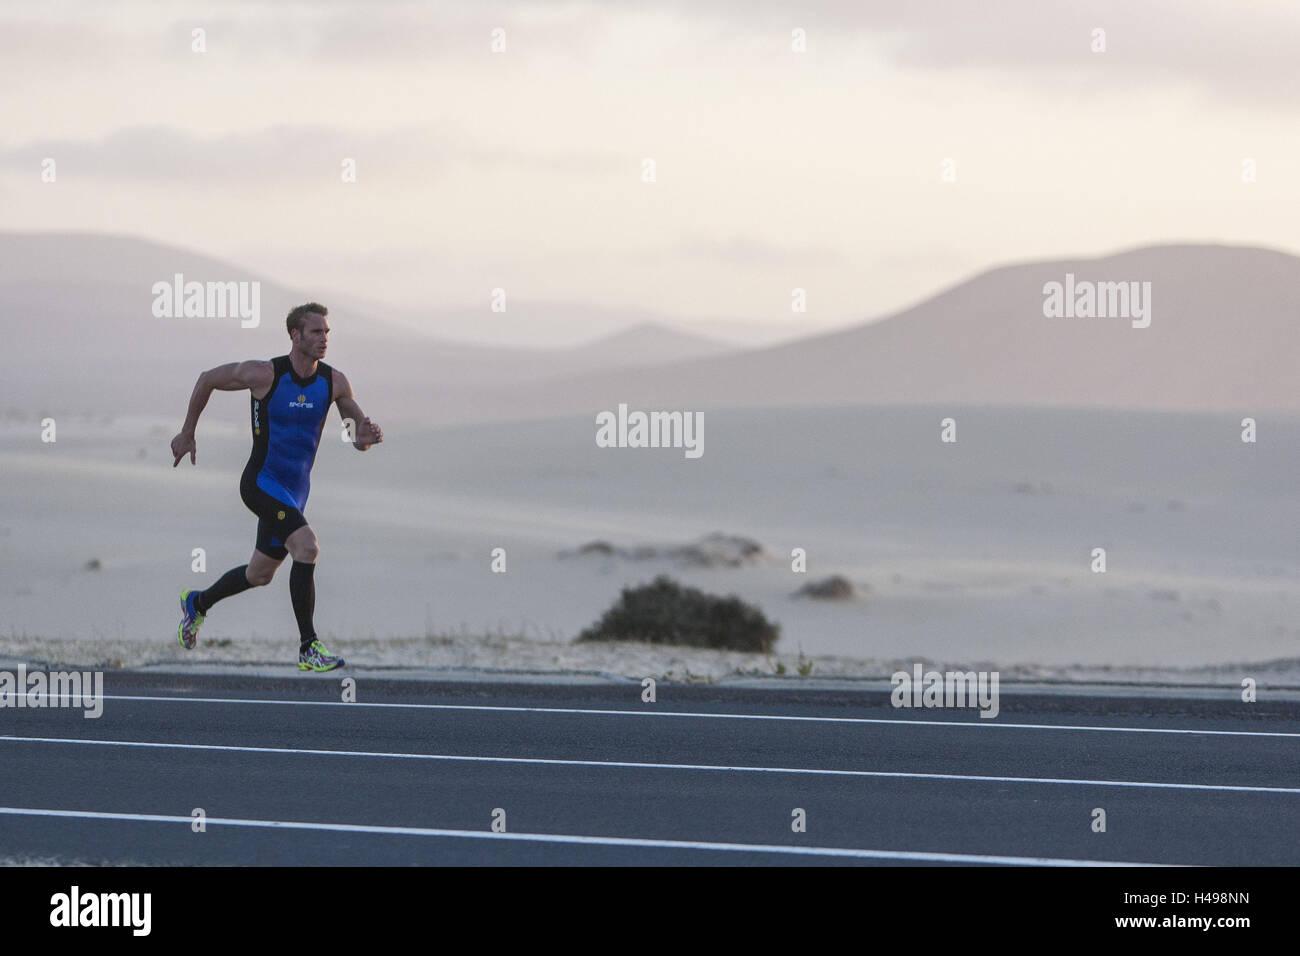 Runner sprints on asphalt road between the Sand dunes Fuerteventura, - Stock Image